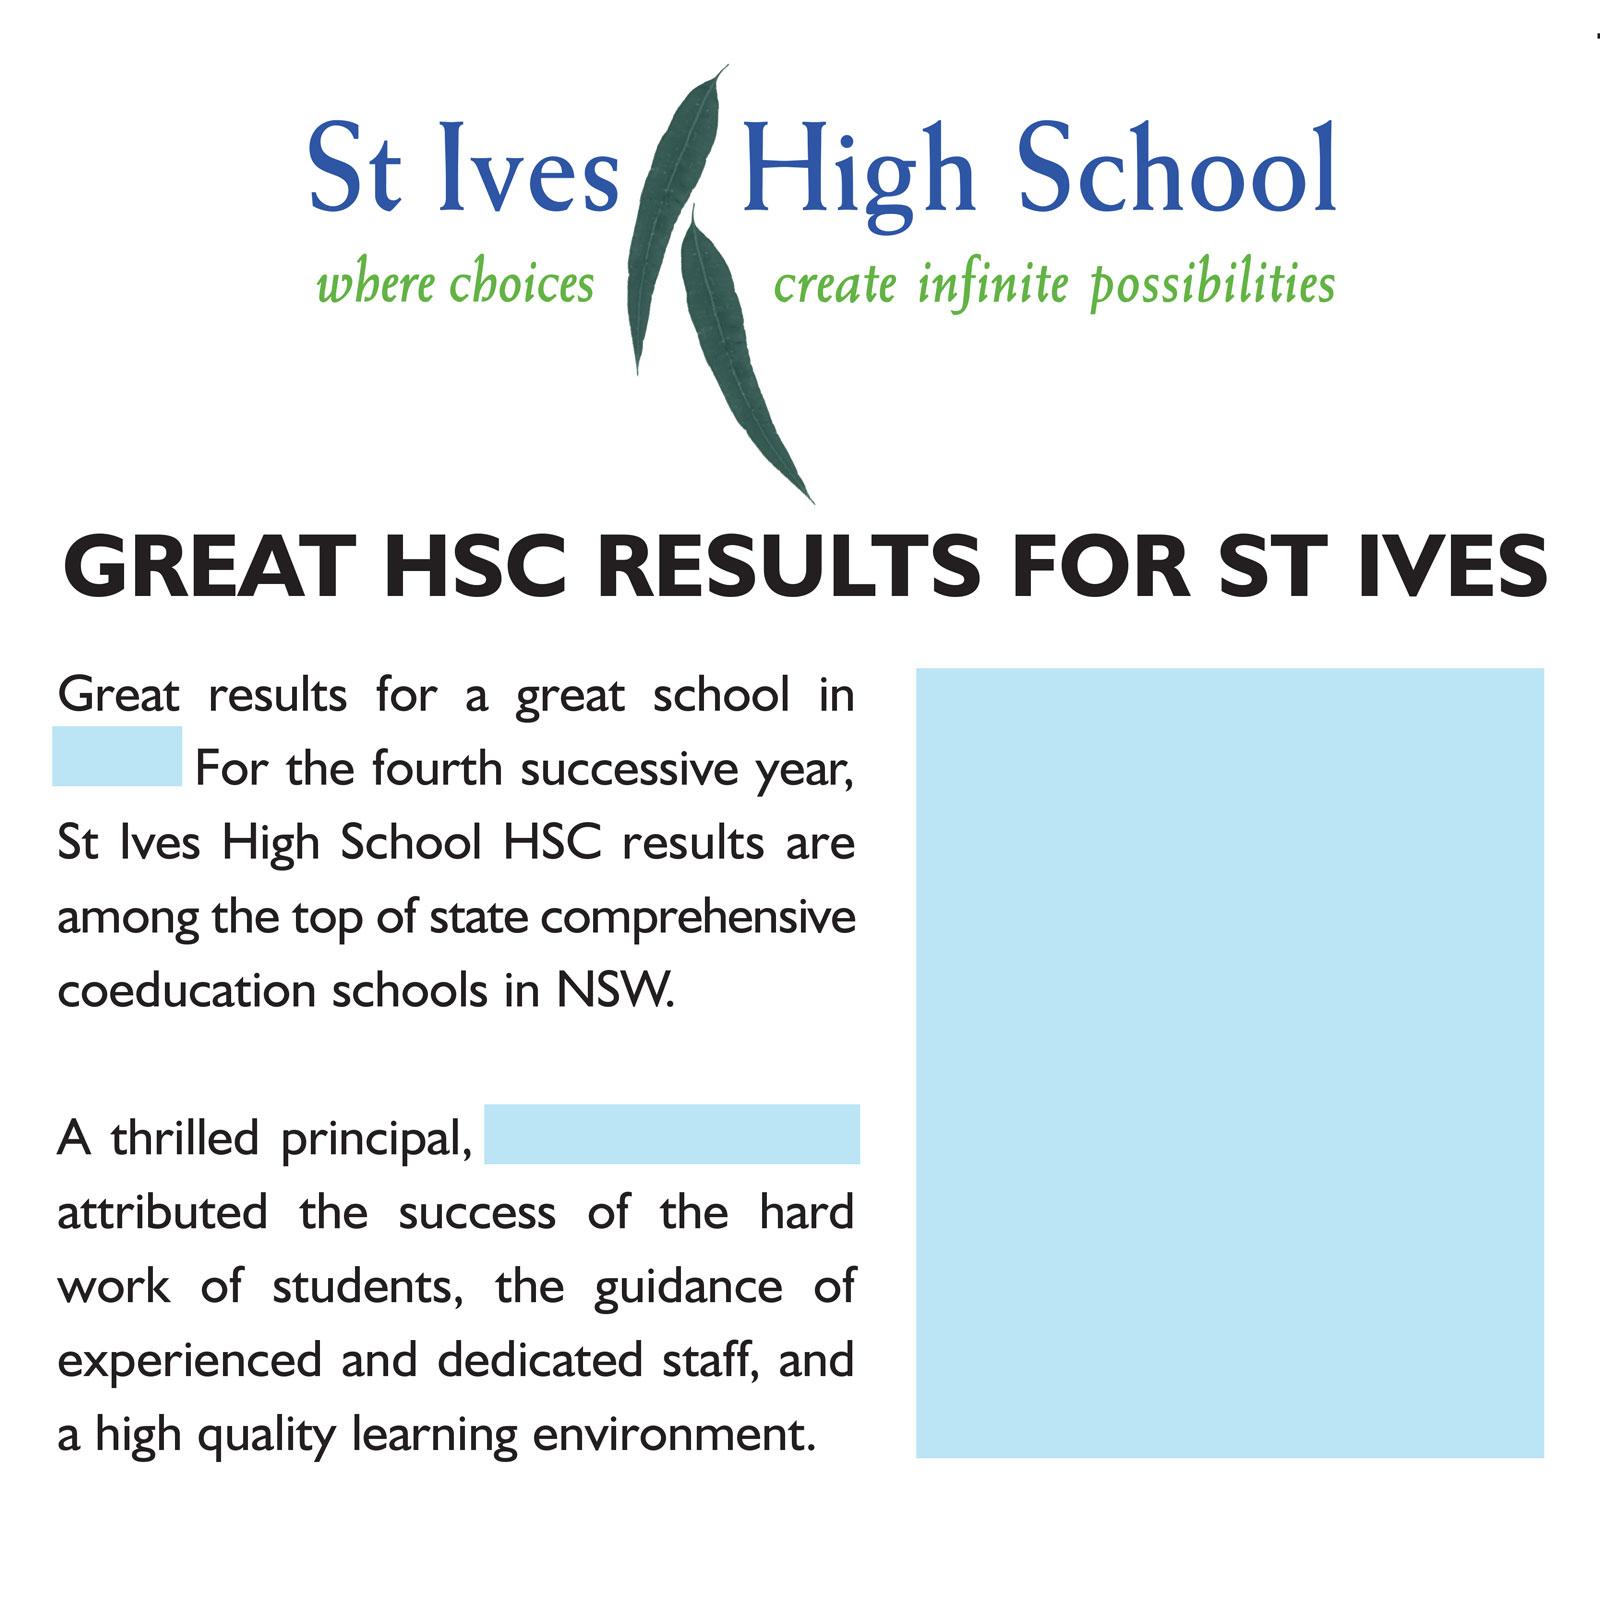 St Ives High School media advertisement